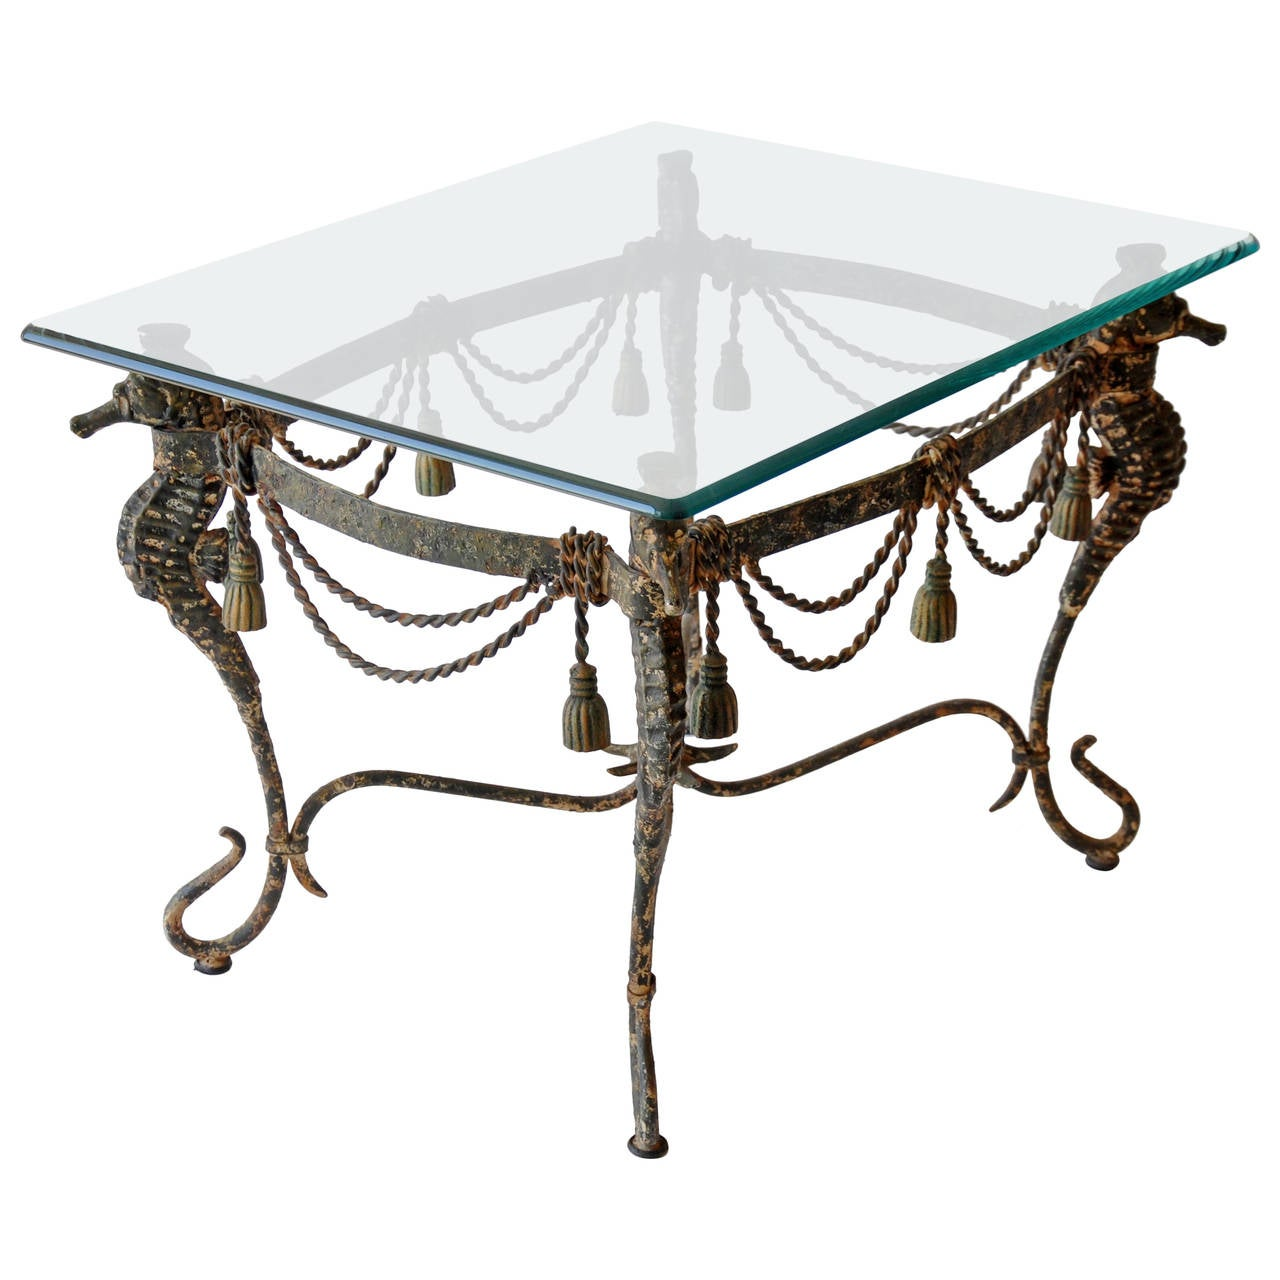 Charming Mid Century Iron Seahorse Table 1